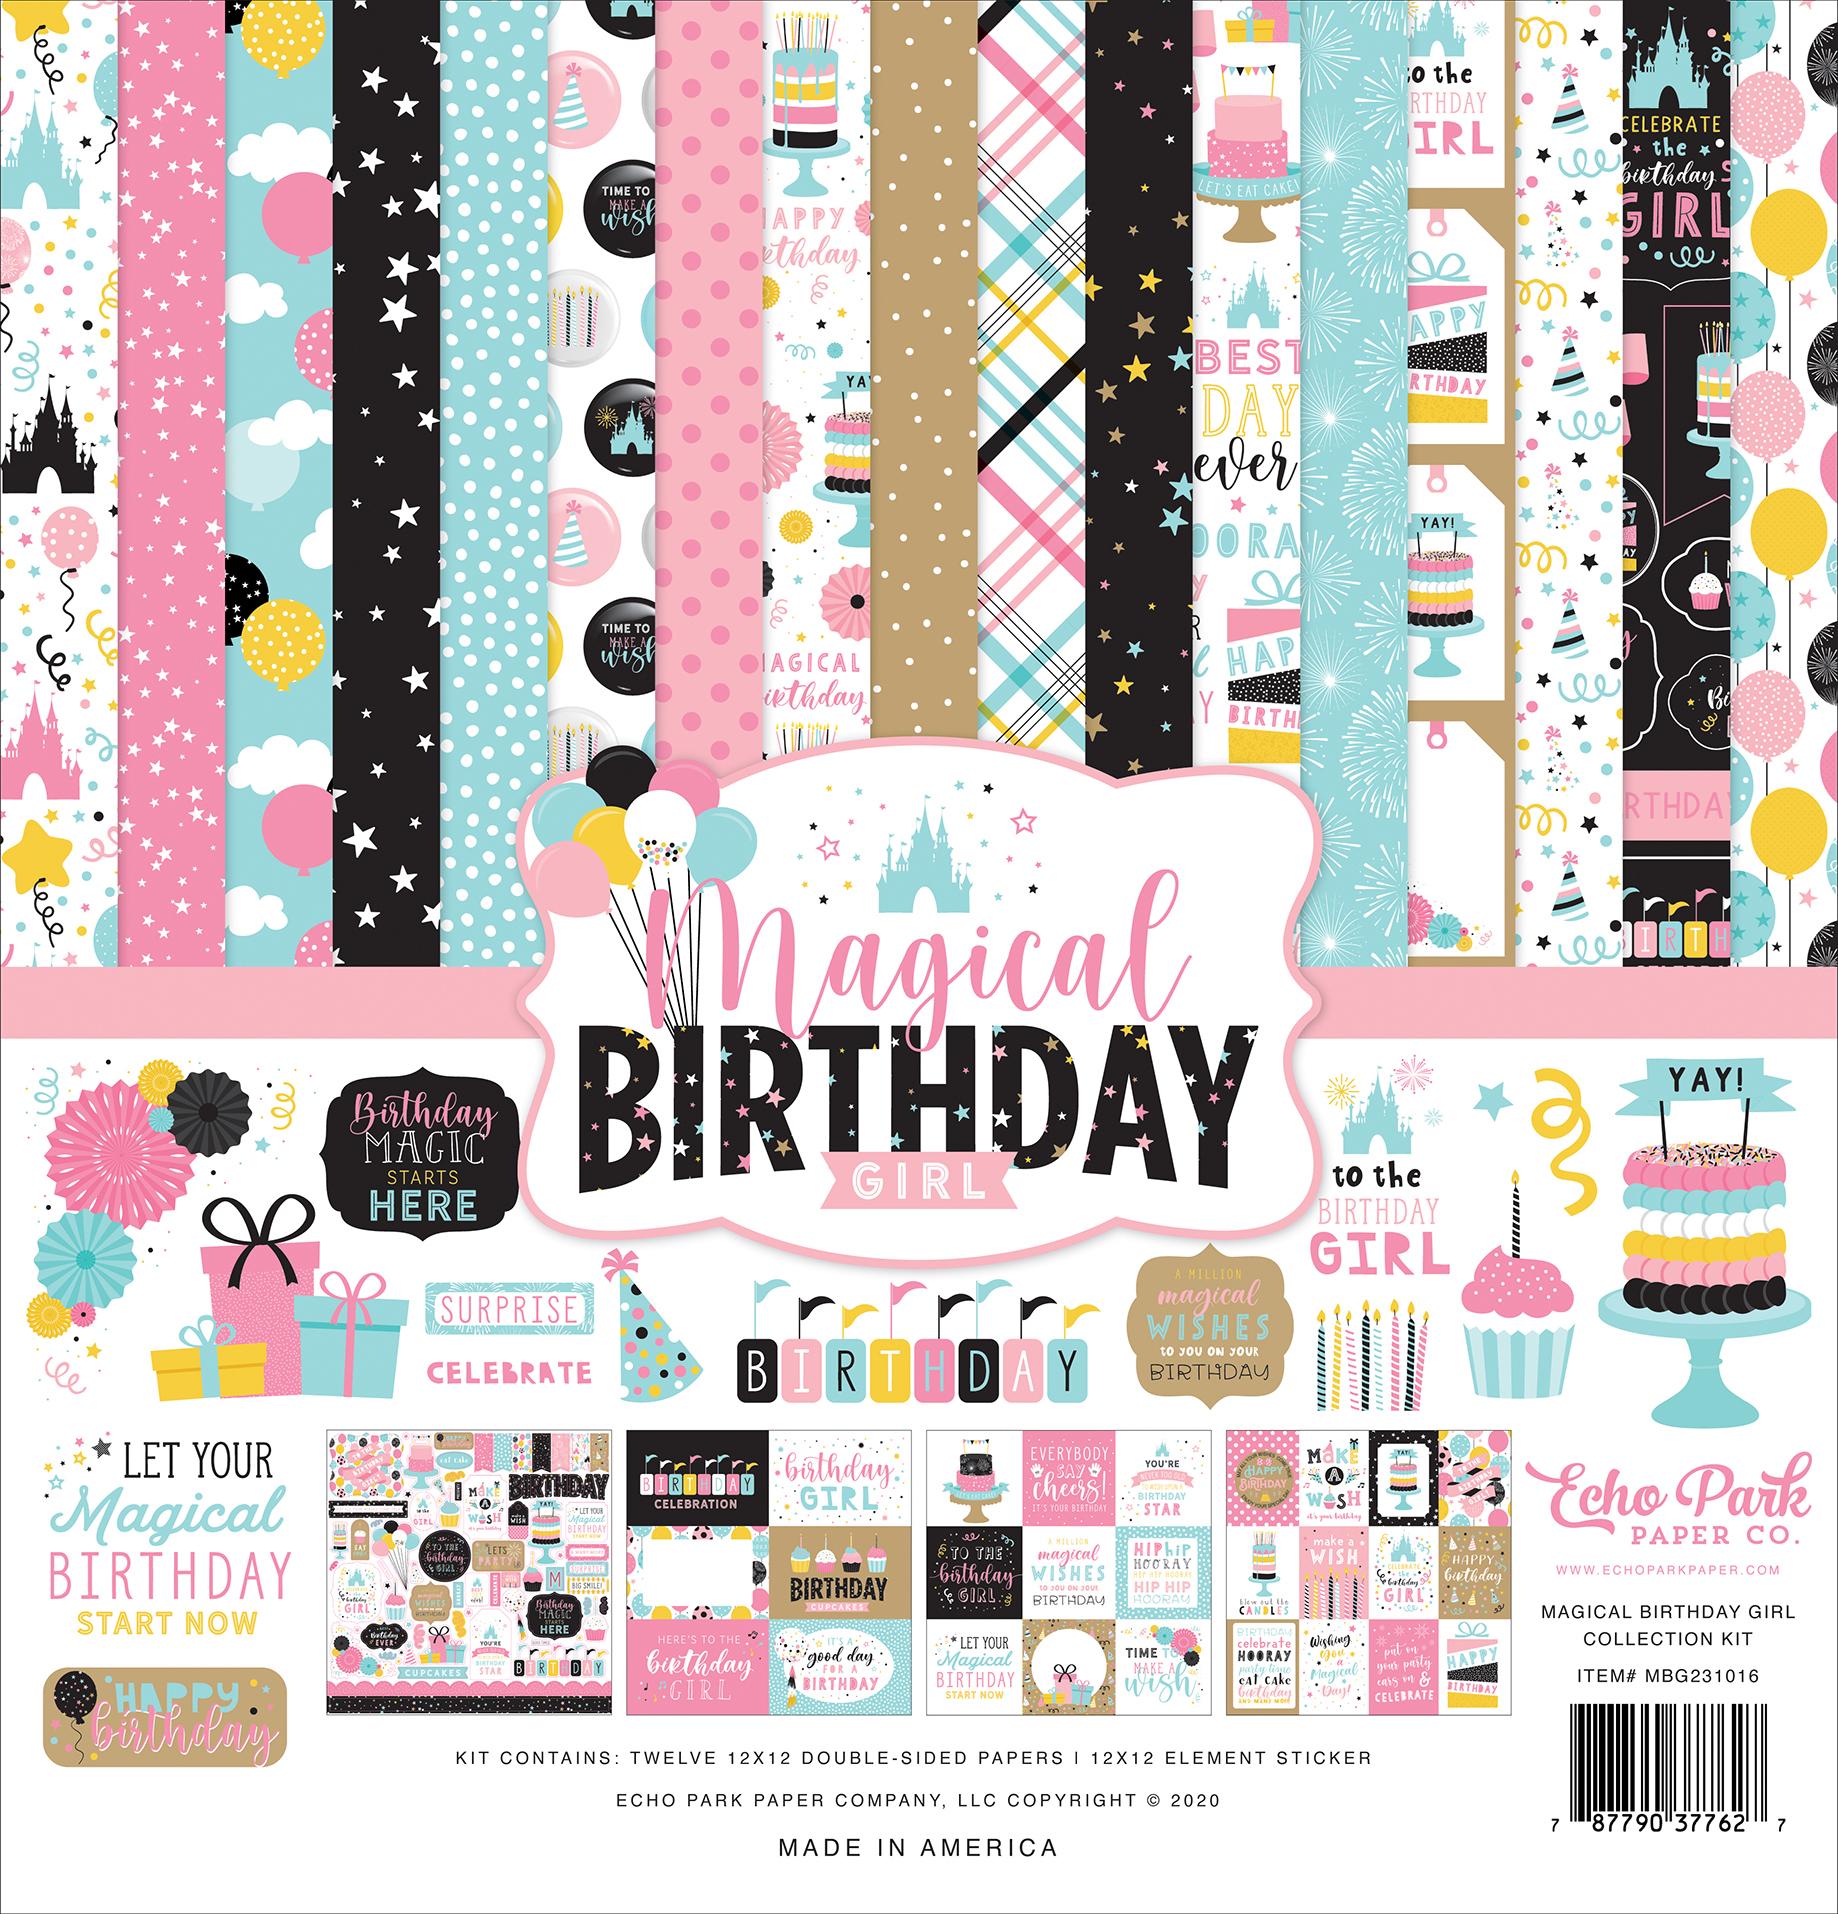 Magical Birthday Girl